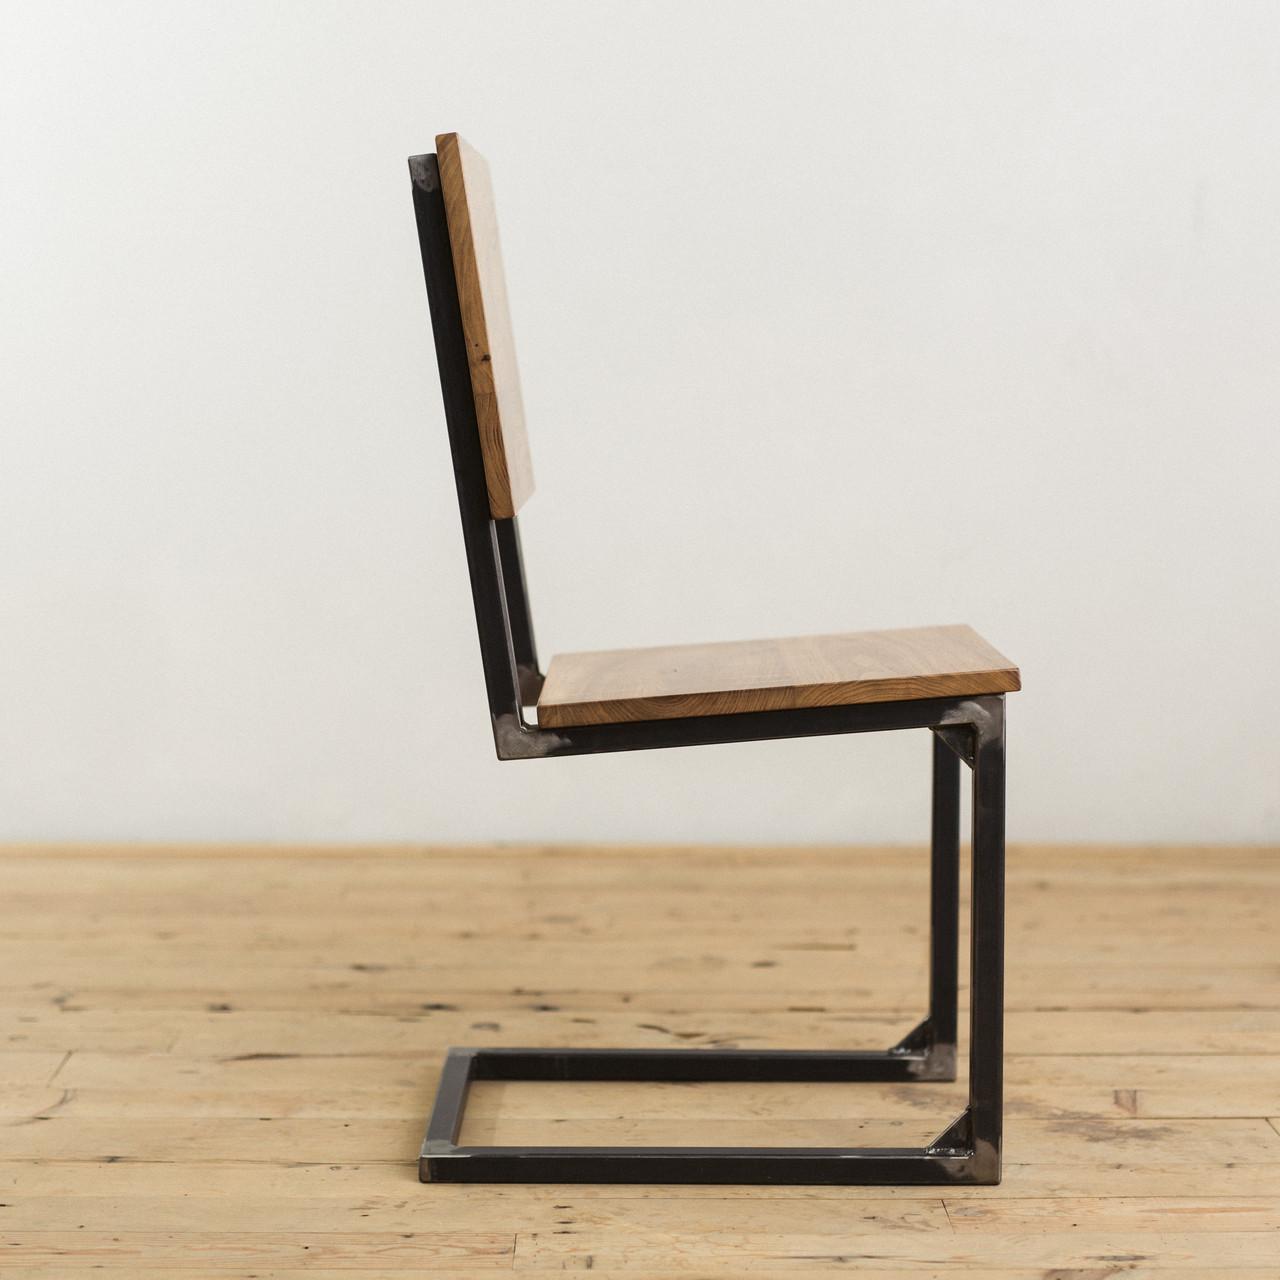 prairie_modern_raw_steel____school_house_chair_2.jpg